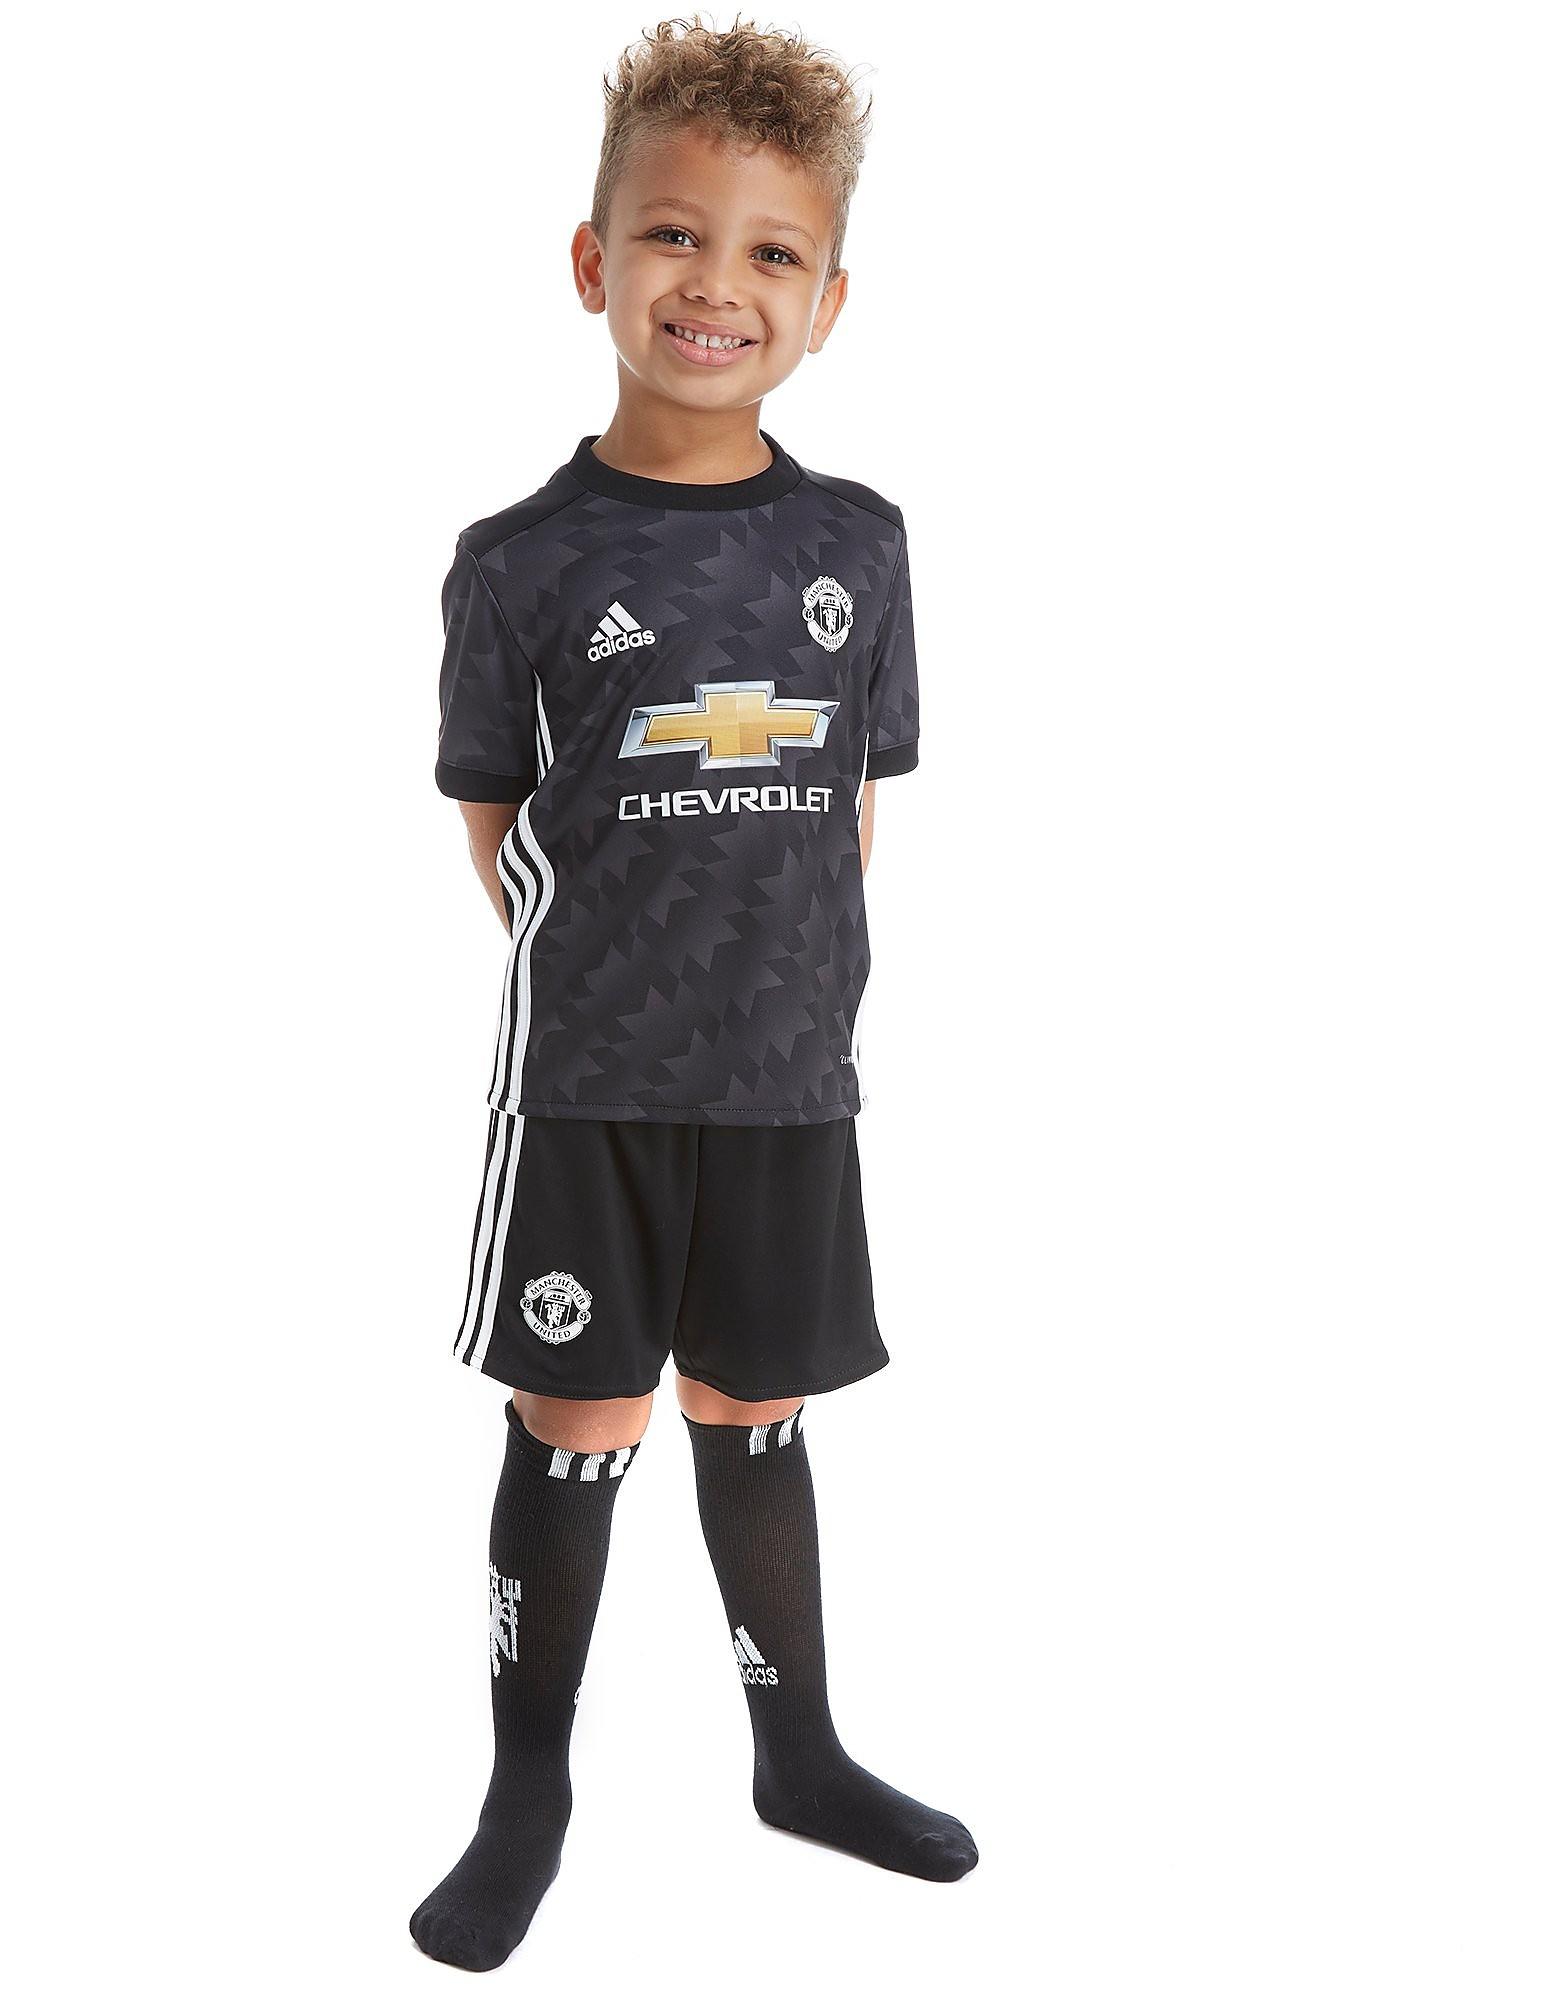 Image de adidas Ensemble Manchester United FC 2017 Enfant PRE ORDER - Black, Black